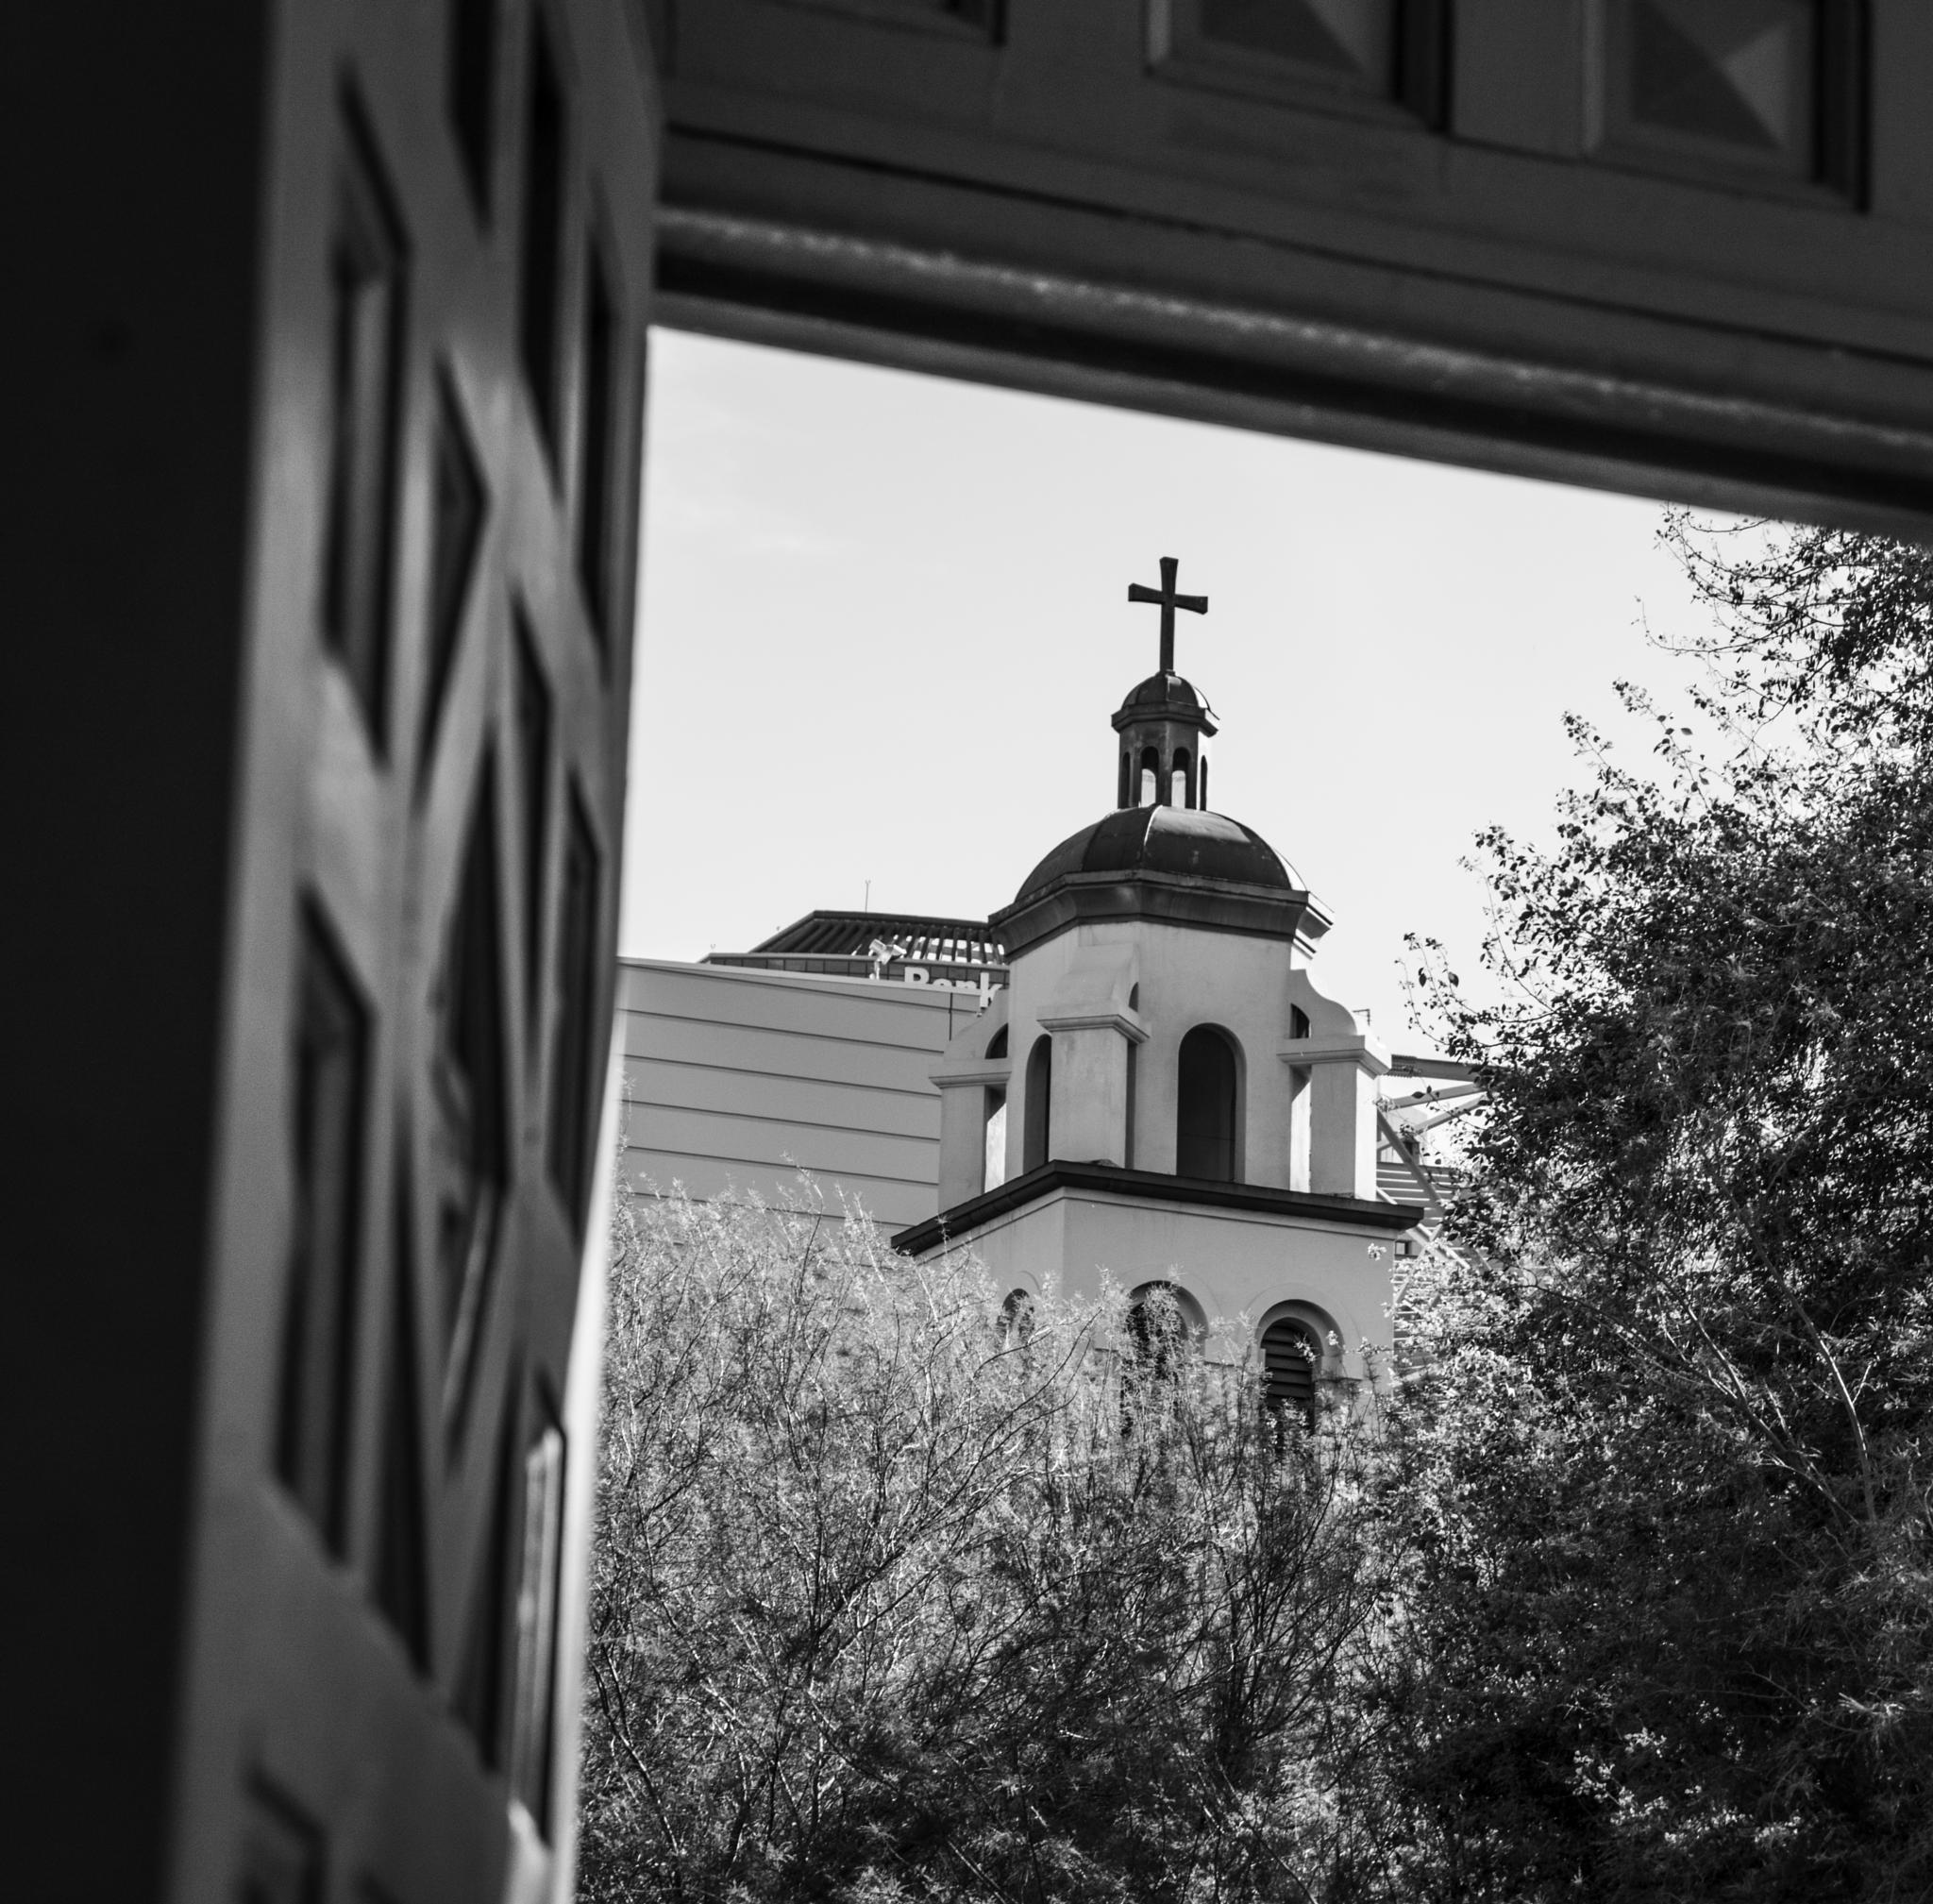 The Church in the Door by Daniel Hanson